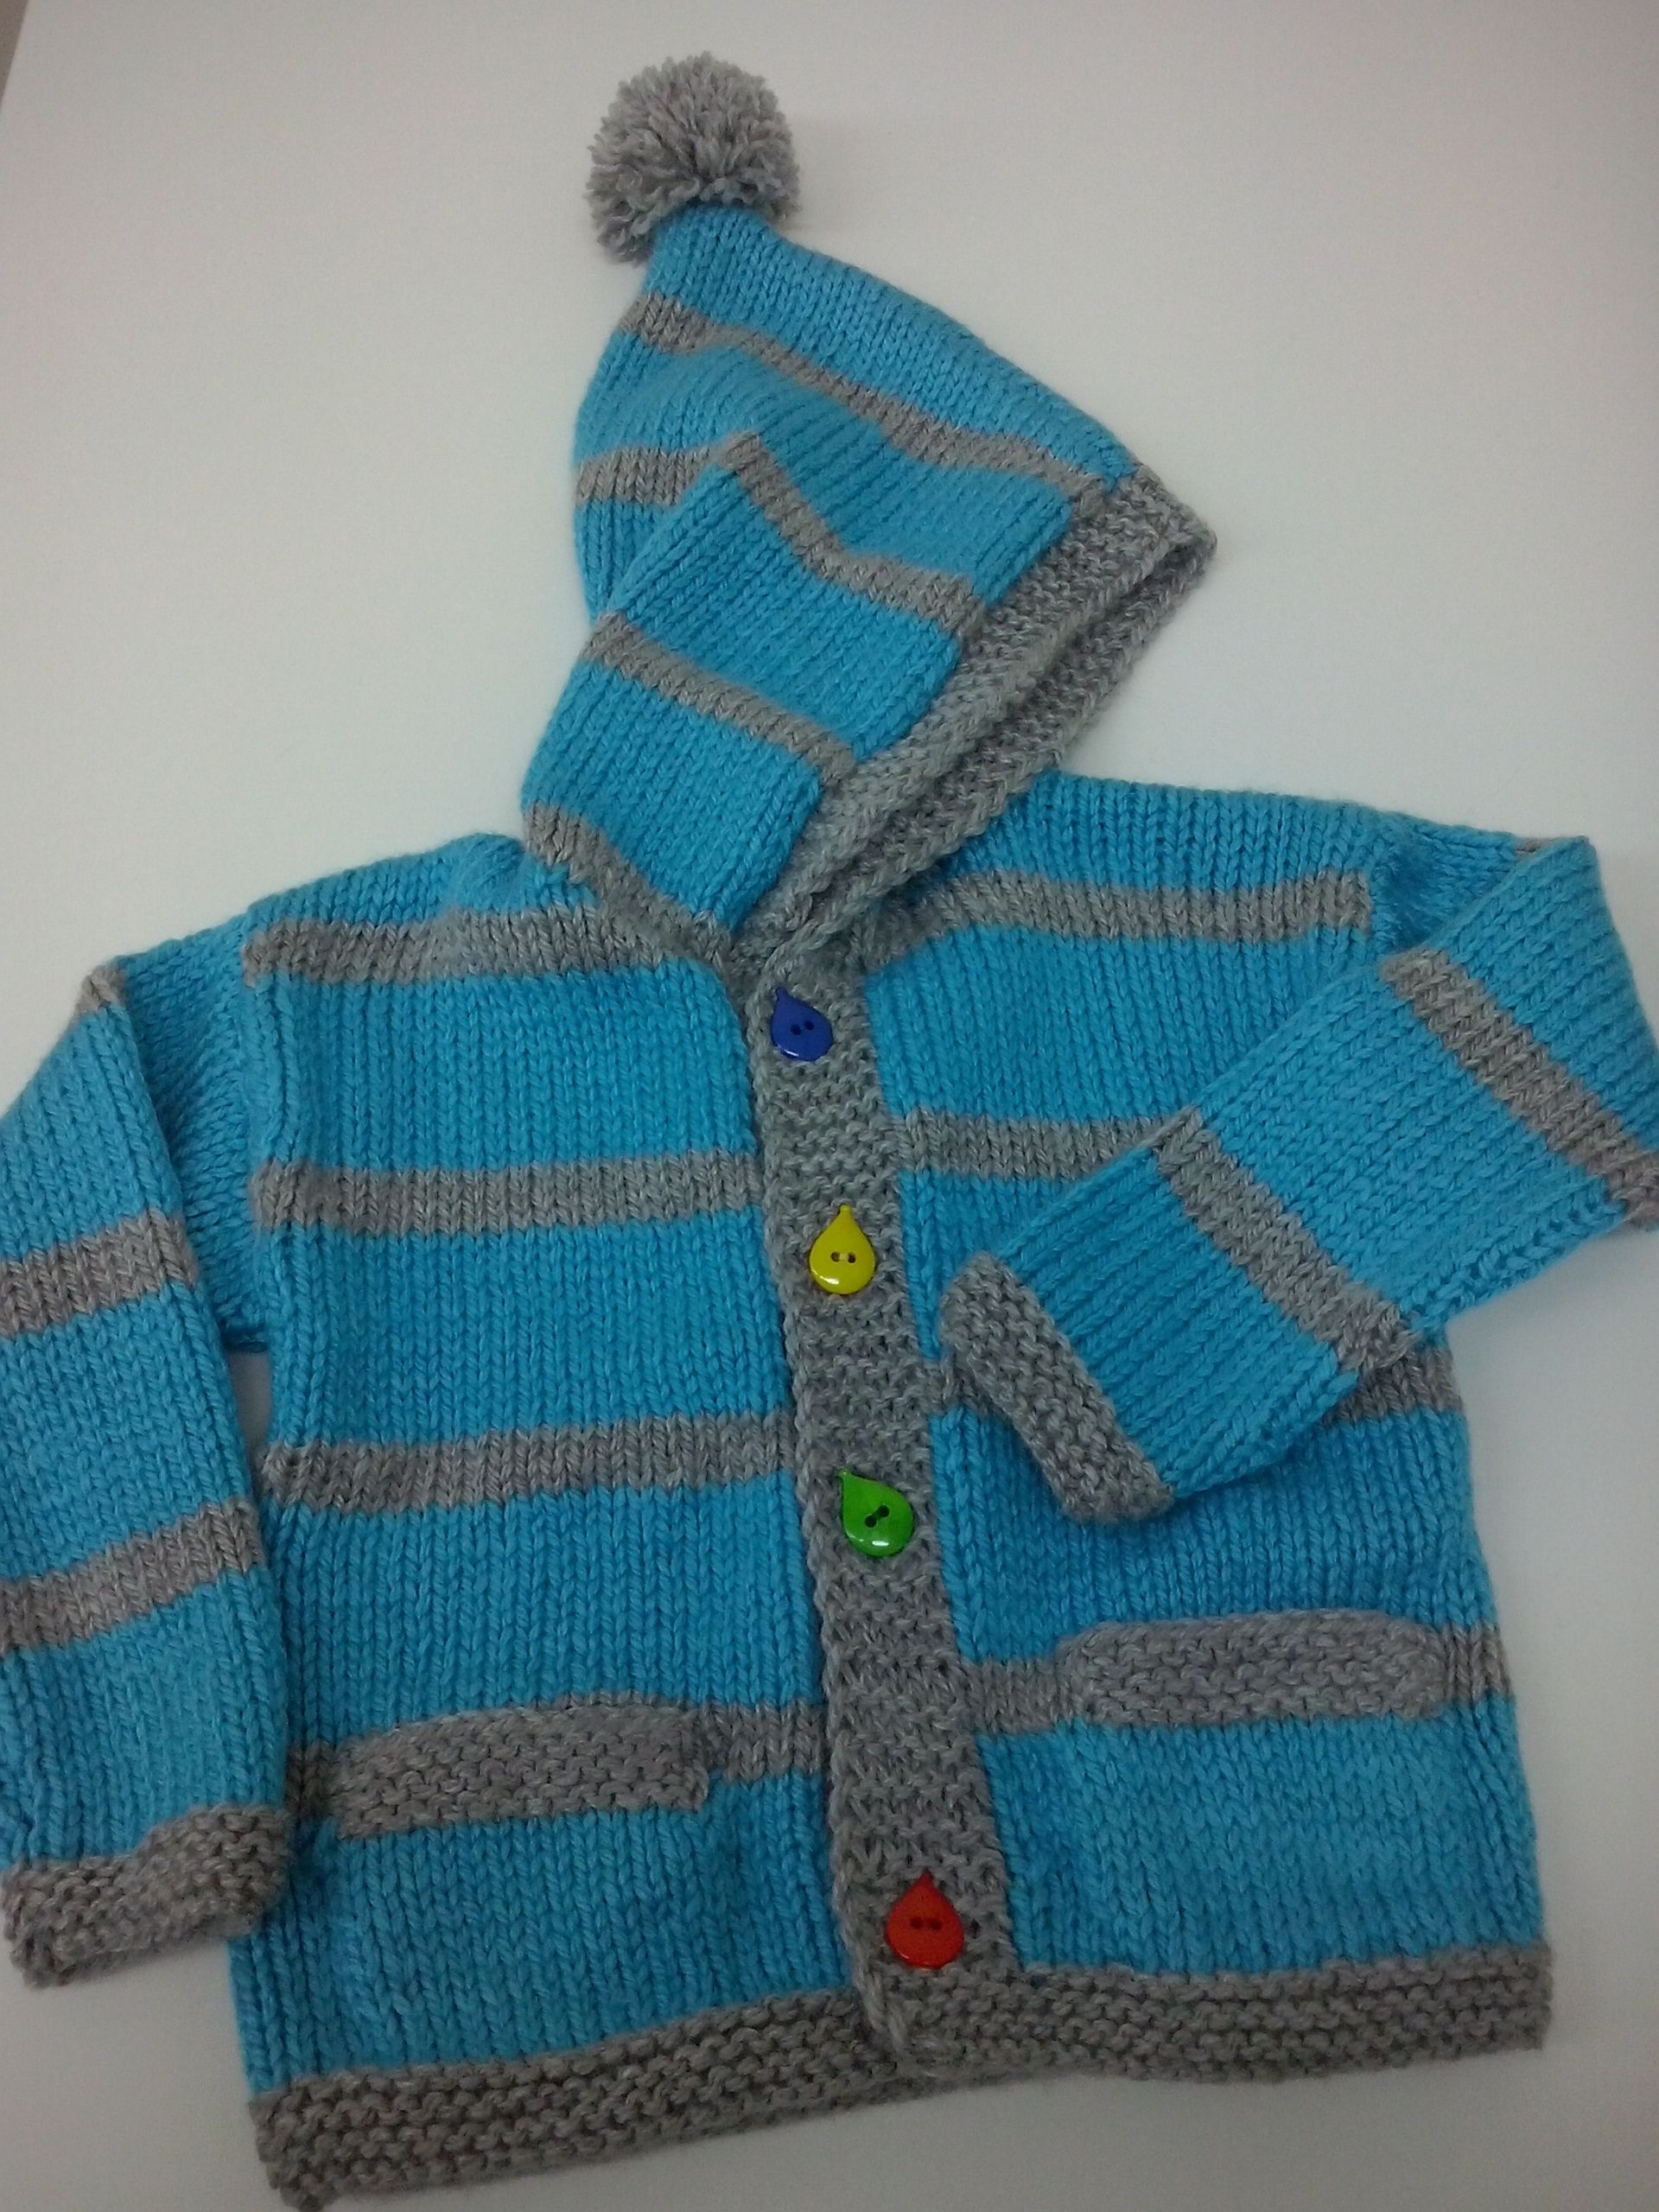 3459615416d Ζακέτα παιδική δίχρωμη,με κουκούλα και τσέπες για τον μικρό Λουκά ...